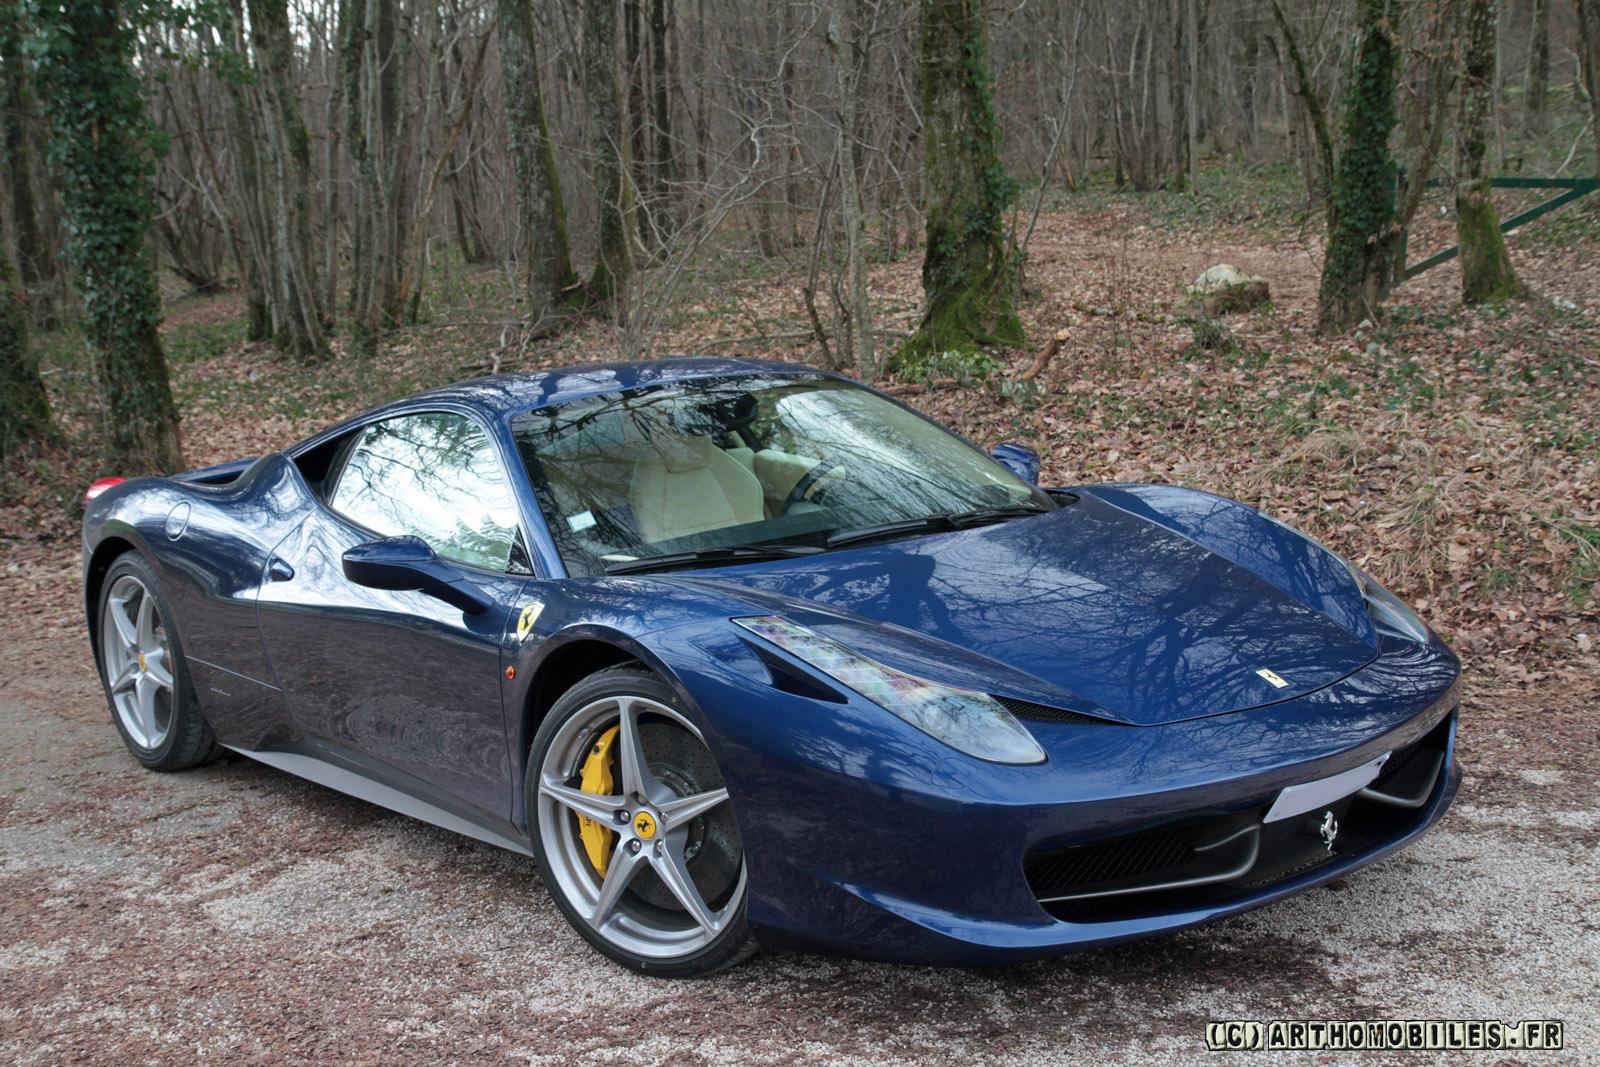 Photo Shoot Ferrari 458 Italia In Tdf Blue Crema